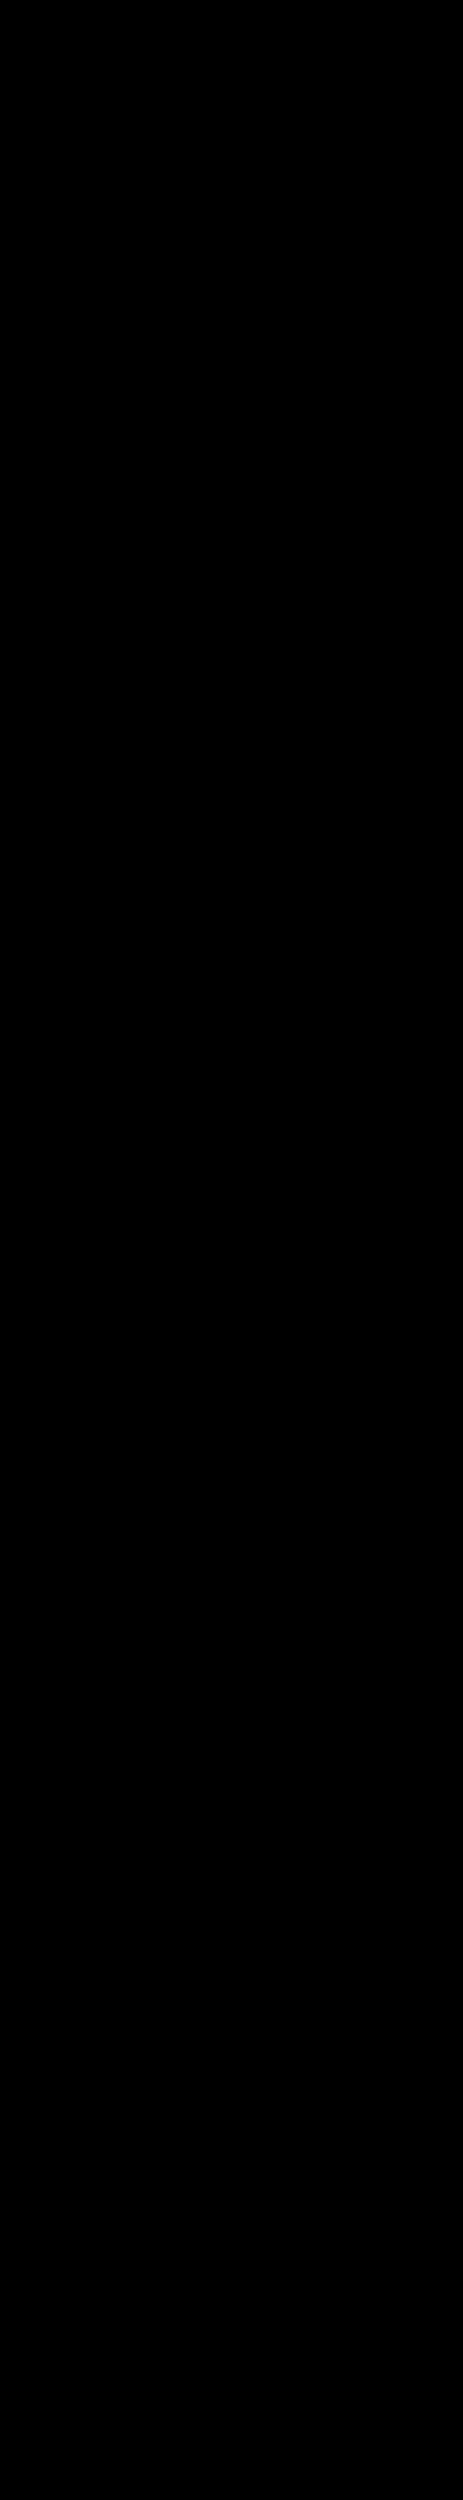 image?w=463&h=31&rev=25&ac=1